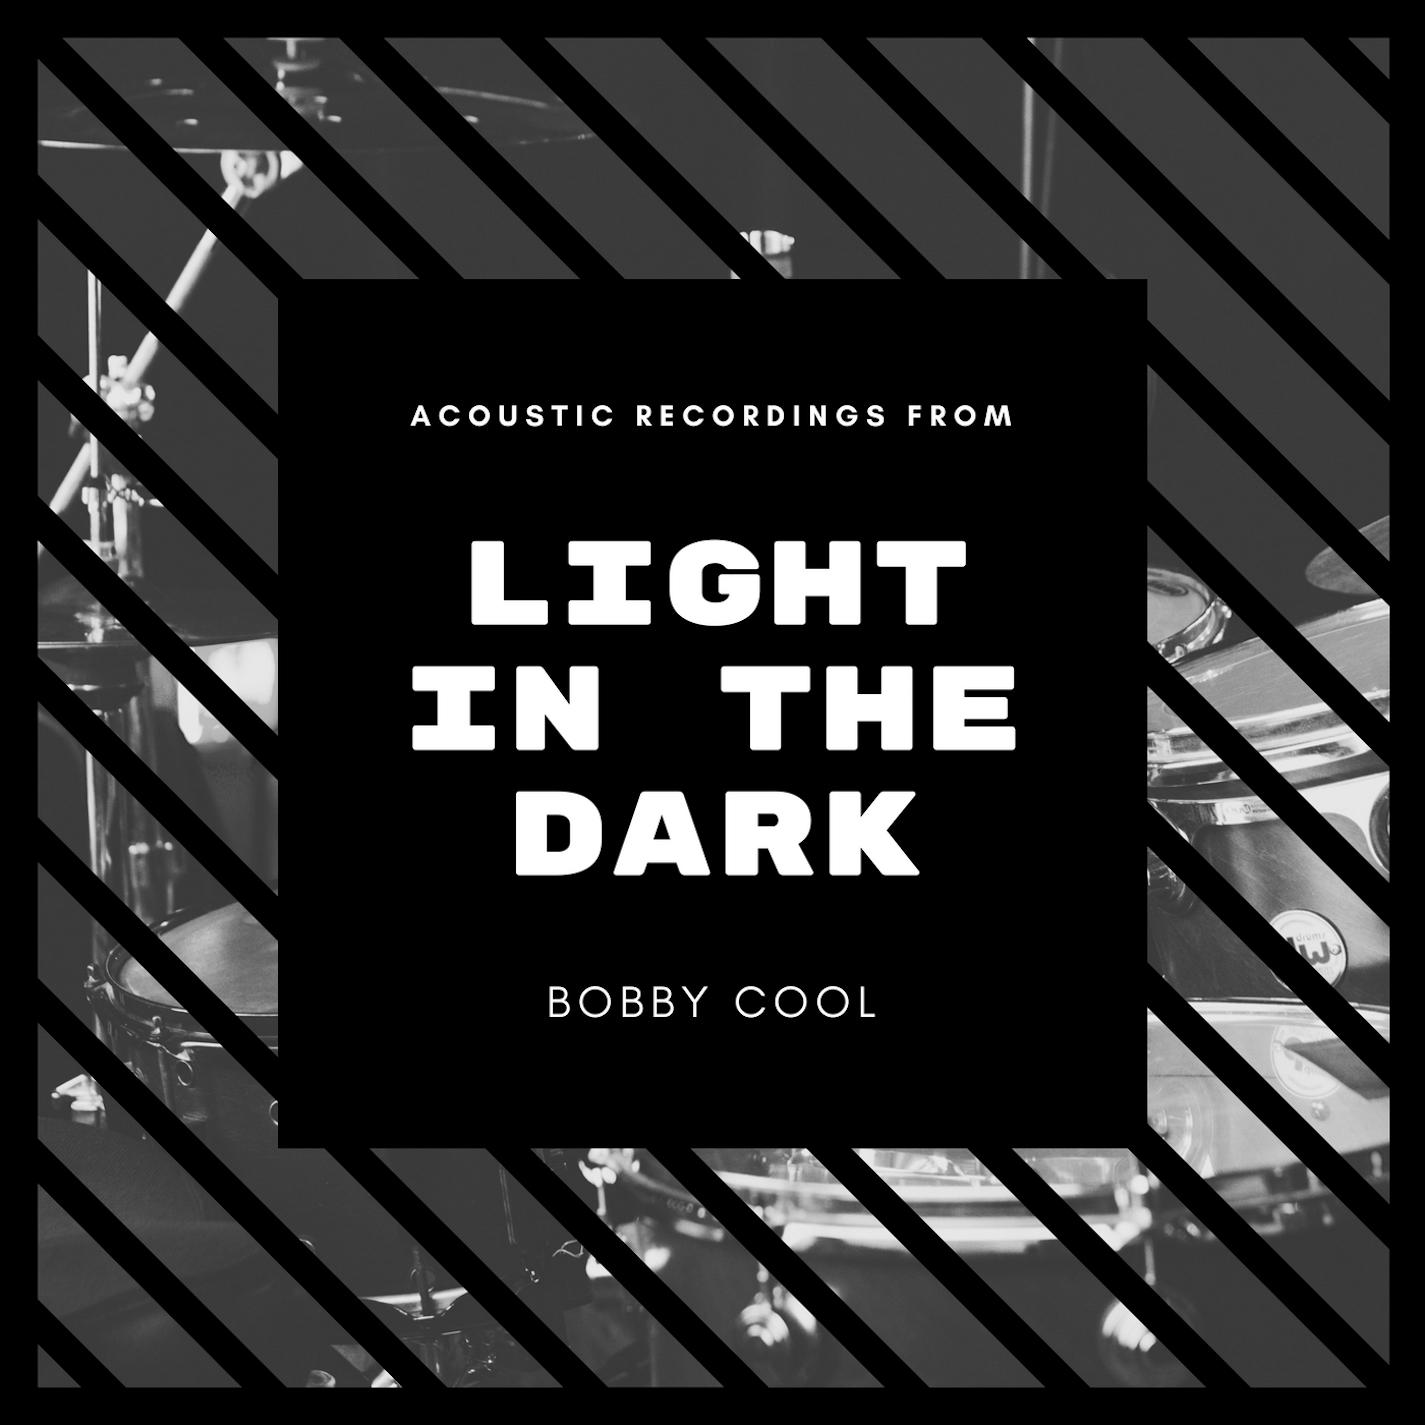 Bobby Cool LIGHT IN THE DARK (Acoustic)